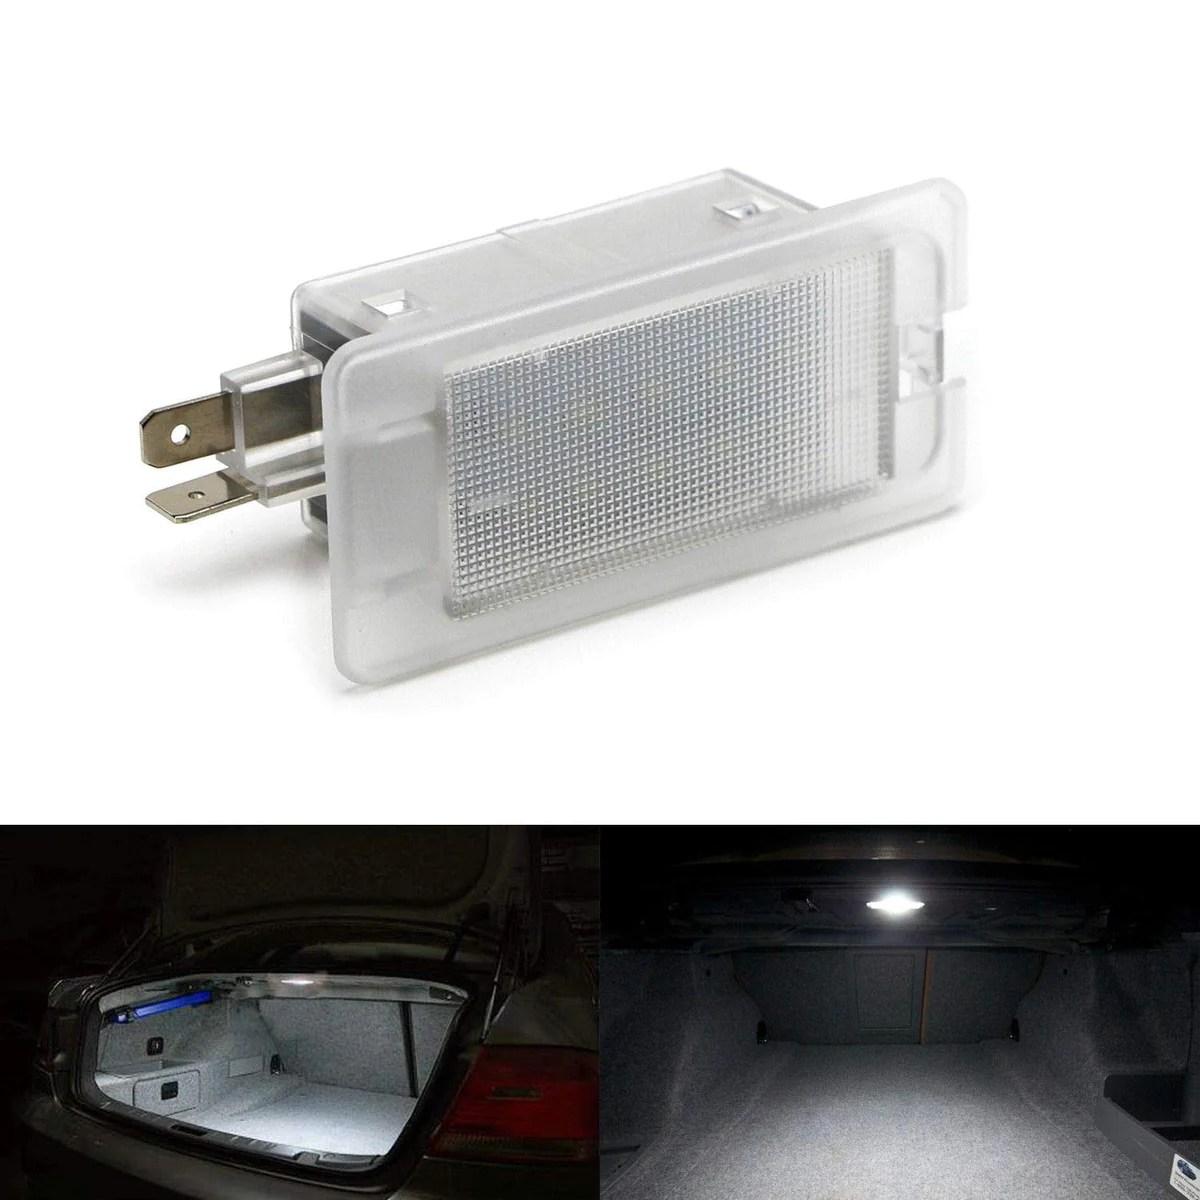 medium resolution of xenon white led trunk glove box light for hyundai accent elantra genesis coupe sonata kia optima forte rio k900 etc great as oem replacement powered by